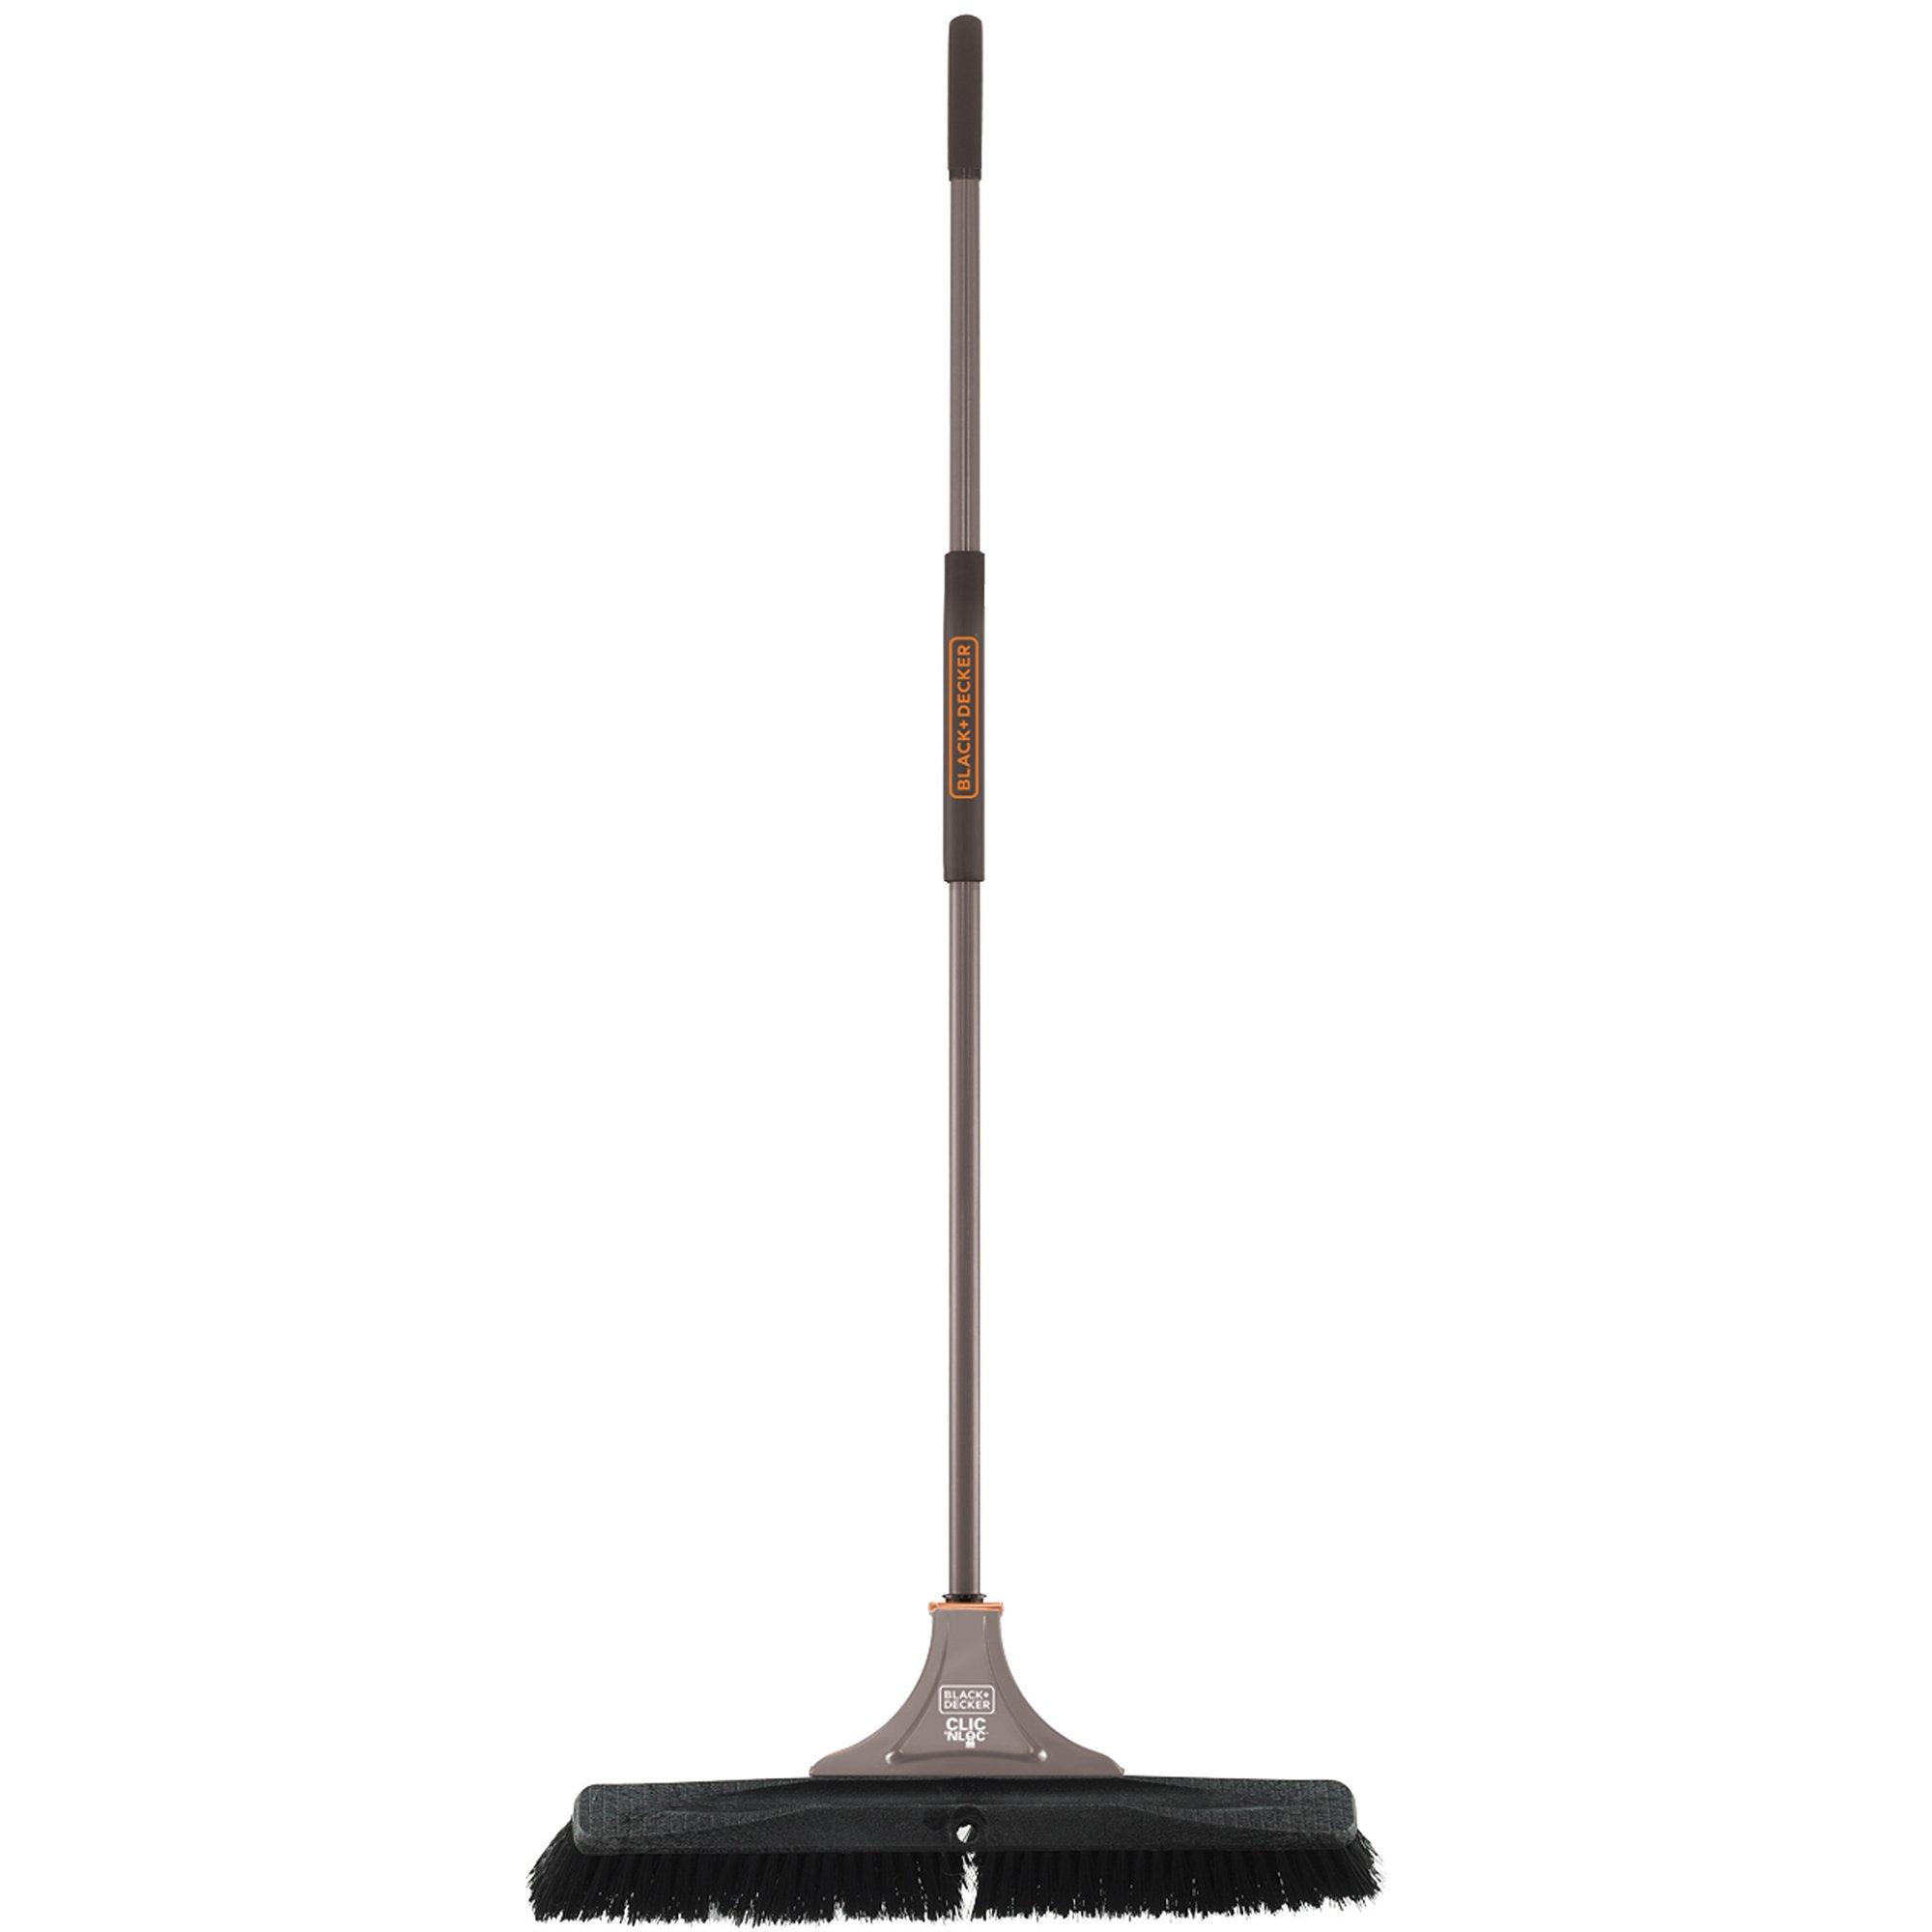 BLACK+DECKER 24-inch Outdoor Push Broom by BLACK+DECKER